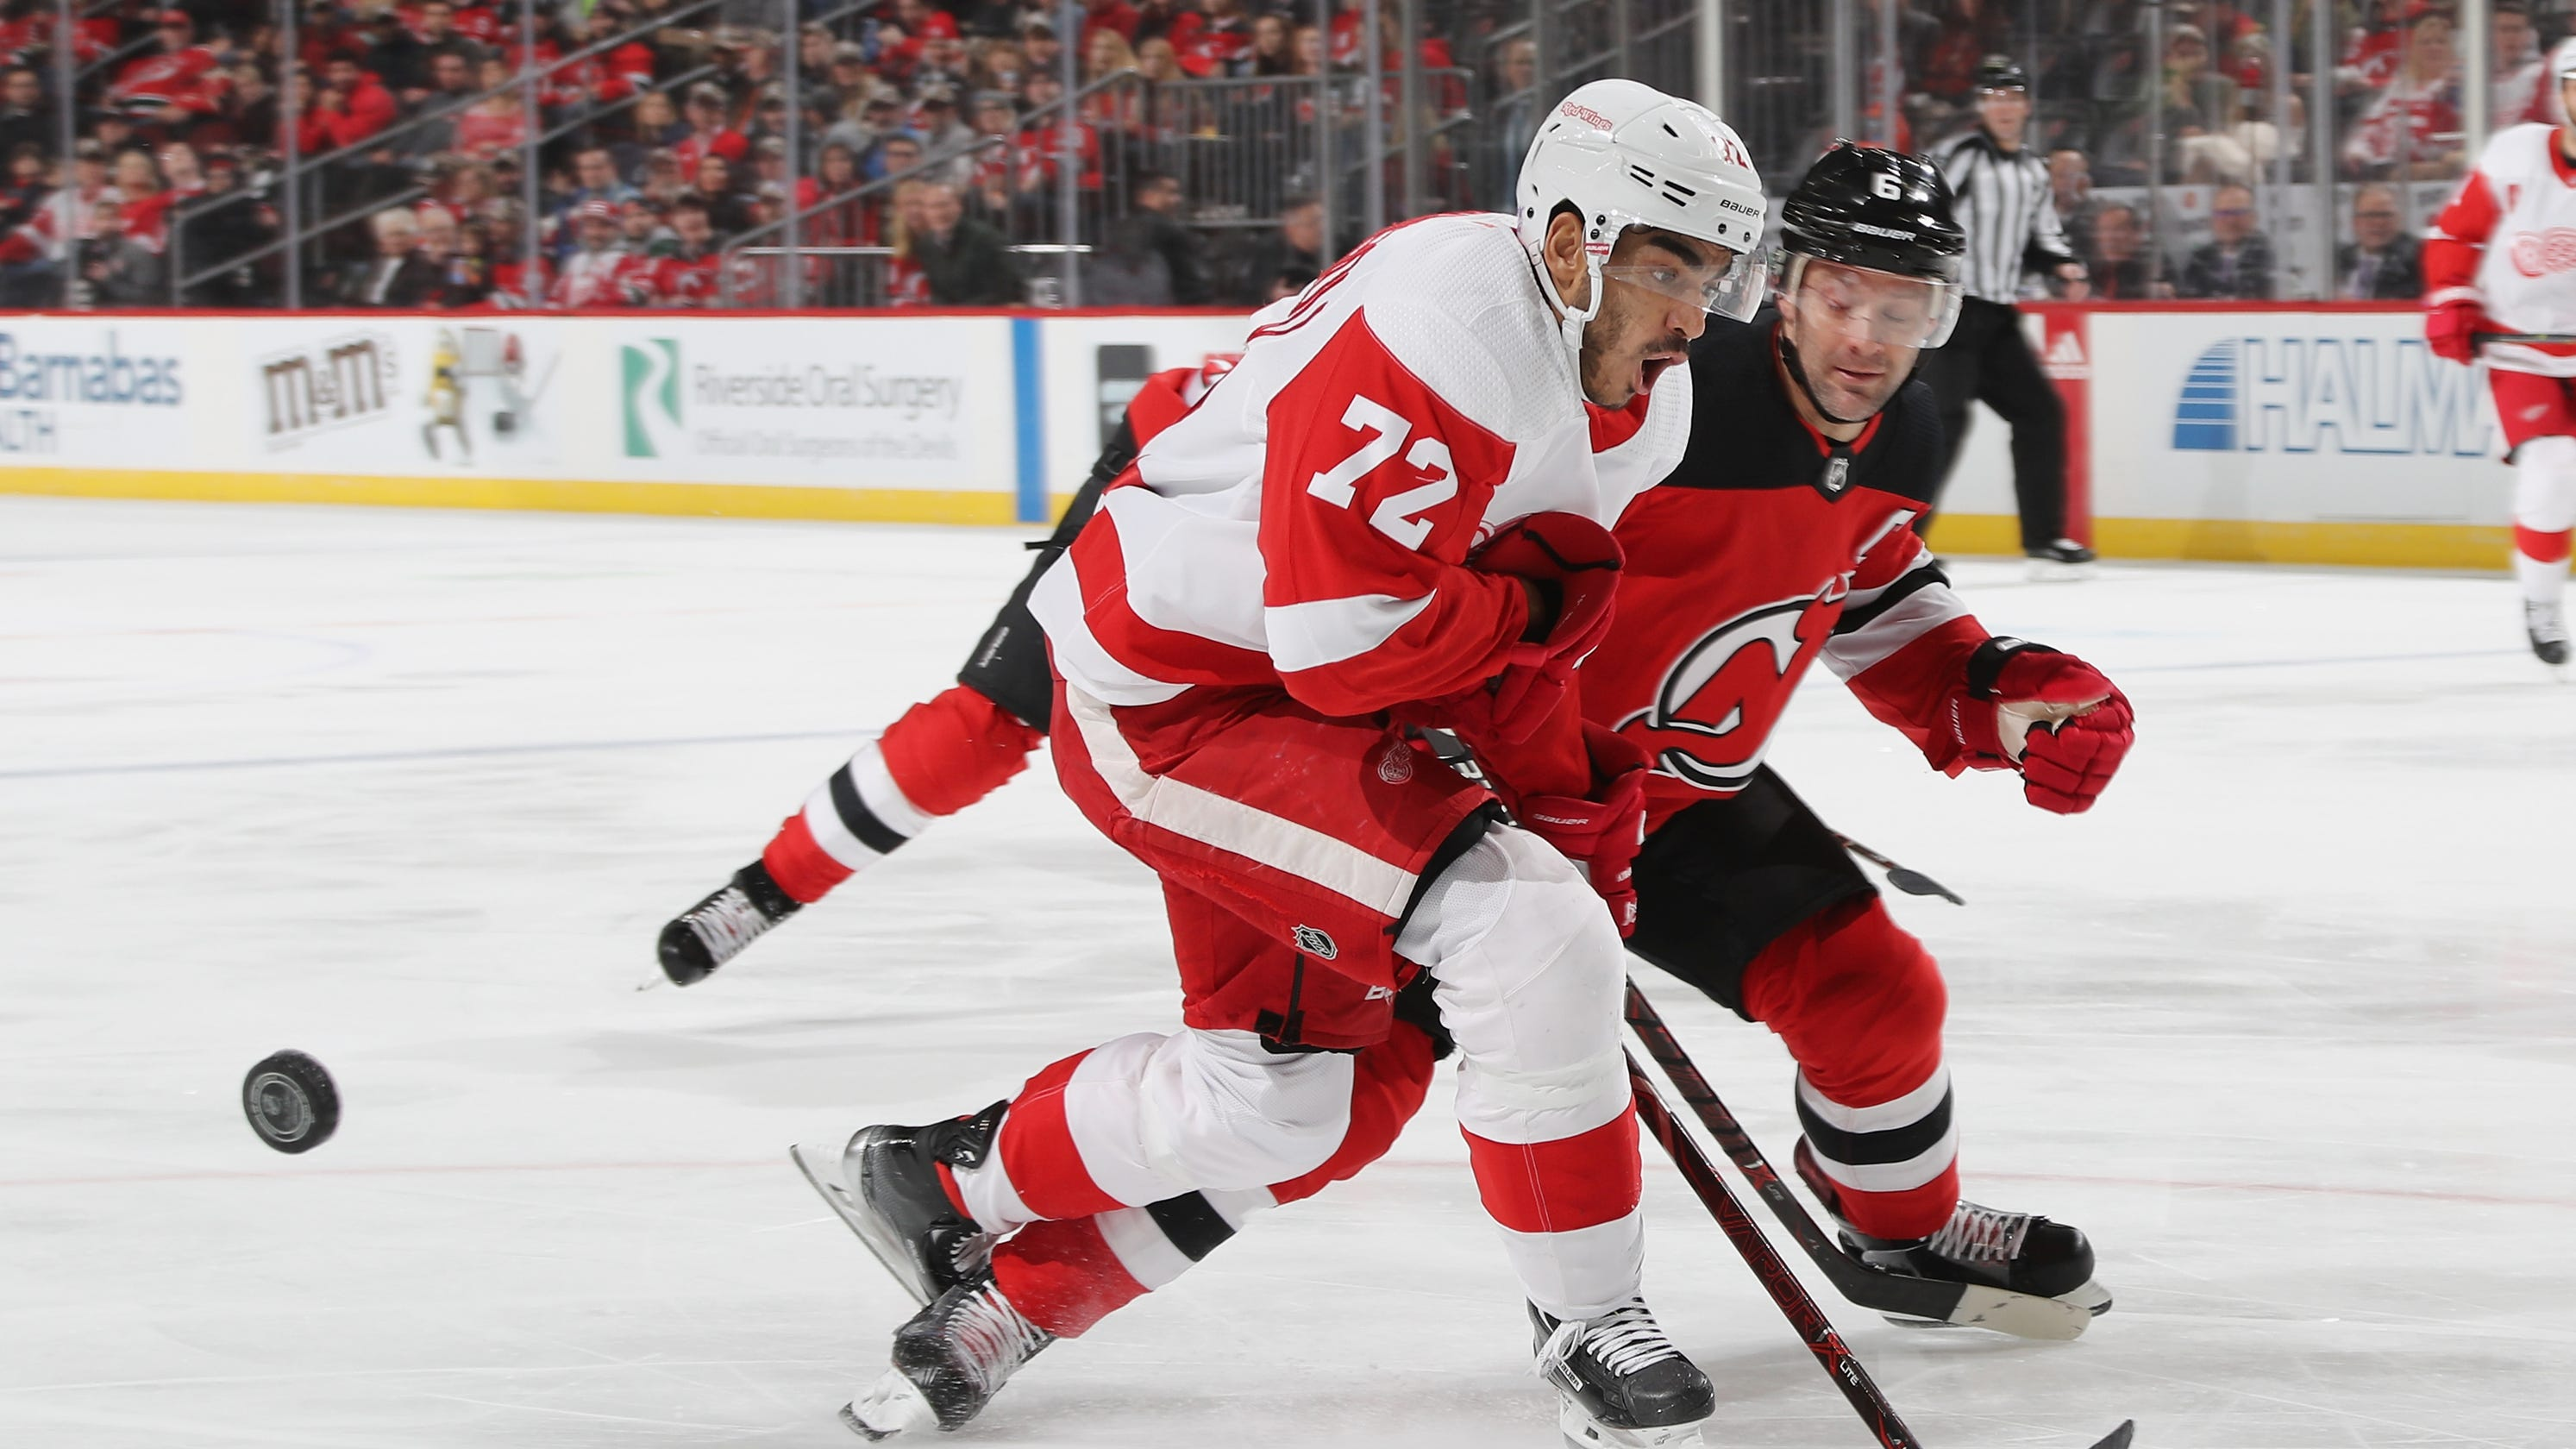 ae1f31485c8 Detroit Red Wings beat Devils in overtime on Dylan Larkin goal